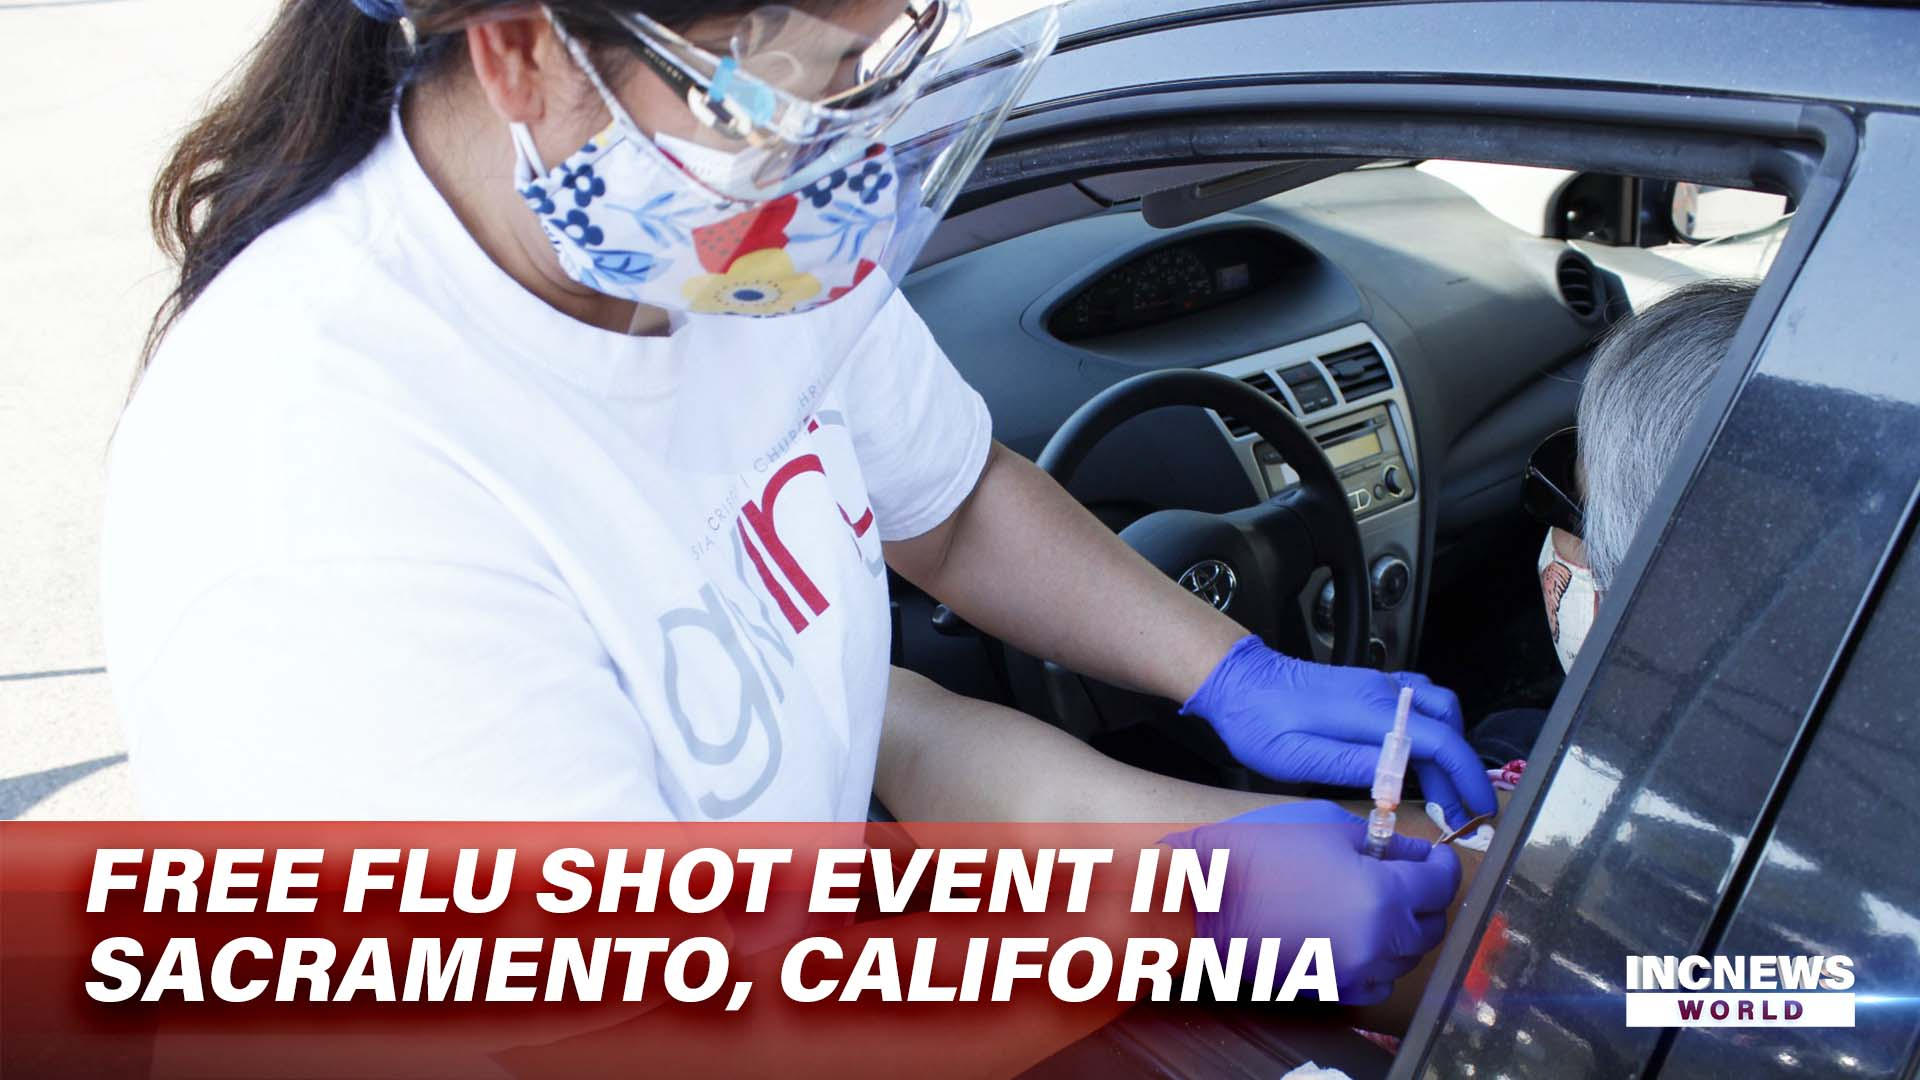 Free Flu Shot Event in Sacramento, California